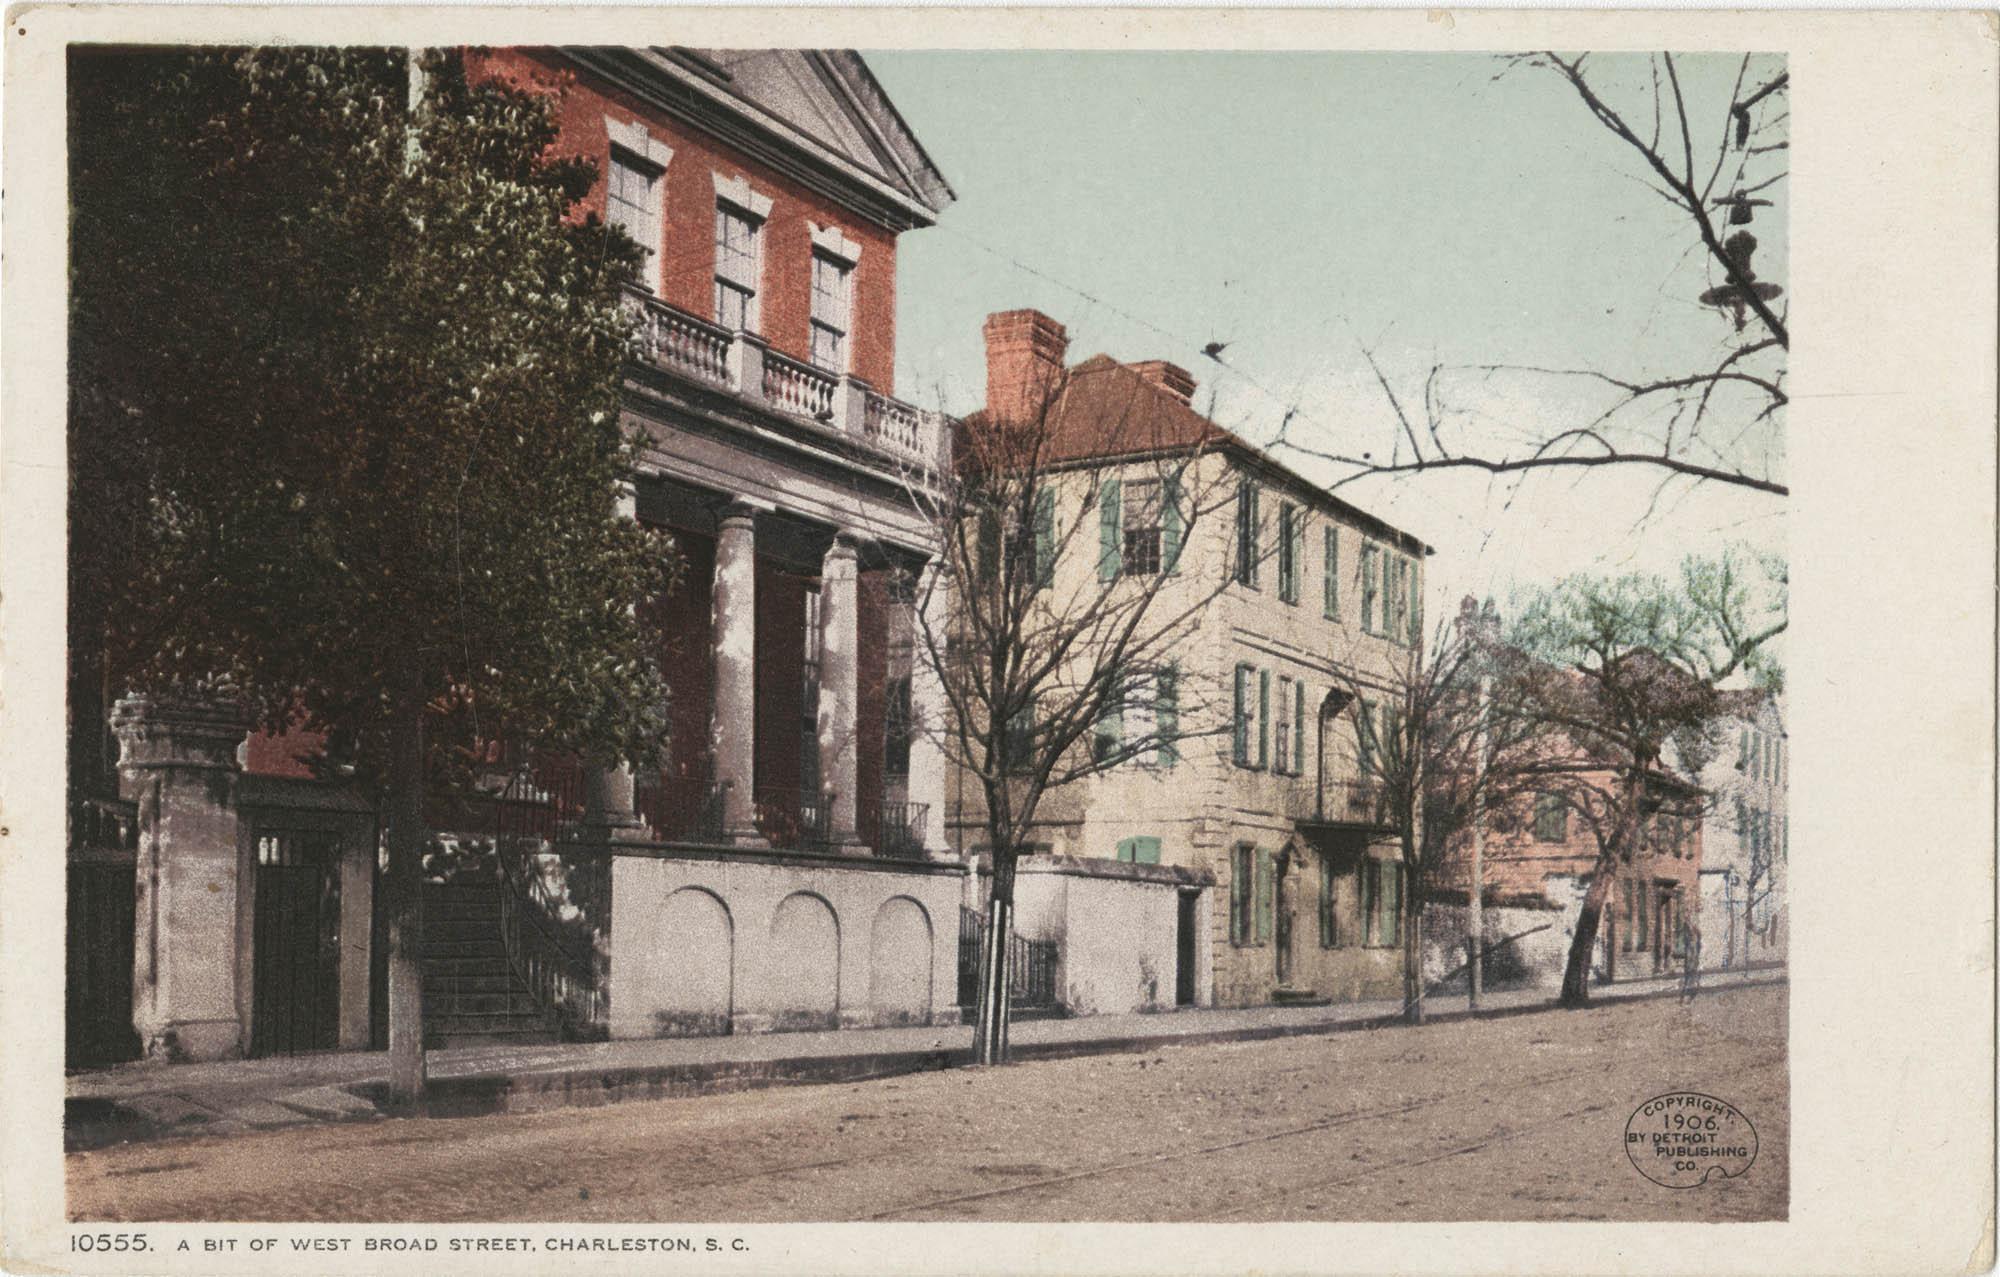 A Bit of West Broad Street, Charleston, S.C.